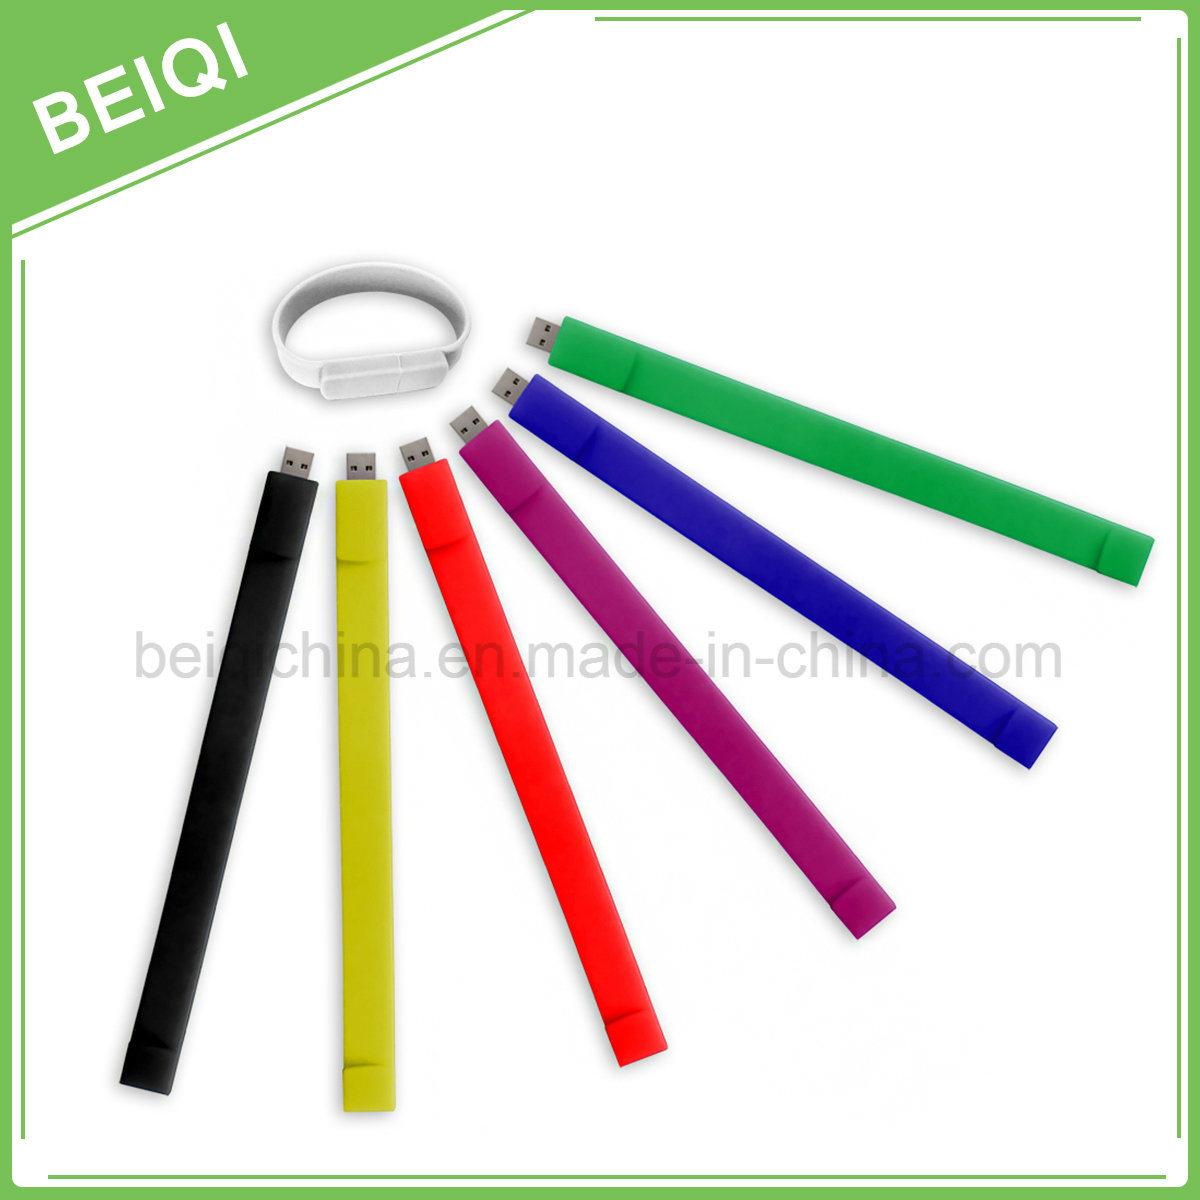 Promotional Custom Silicone Bracelet USB Flash Driver/USB Flash Stick